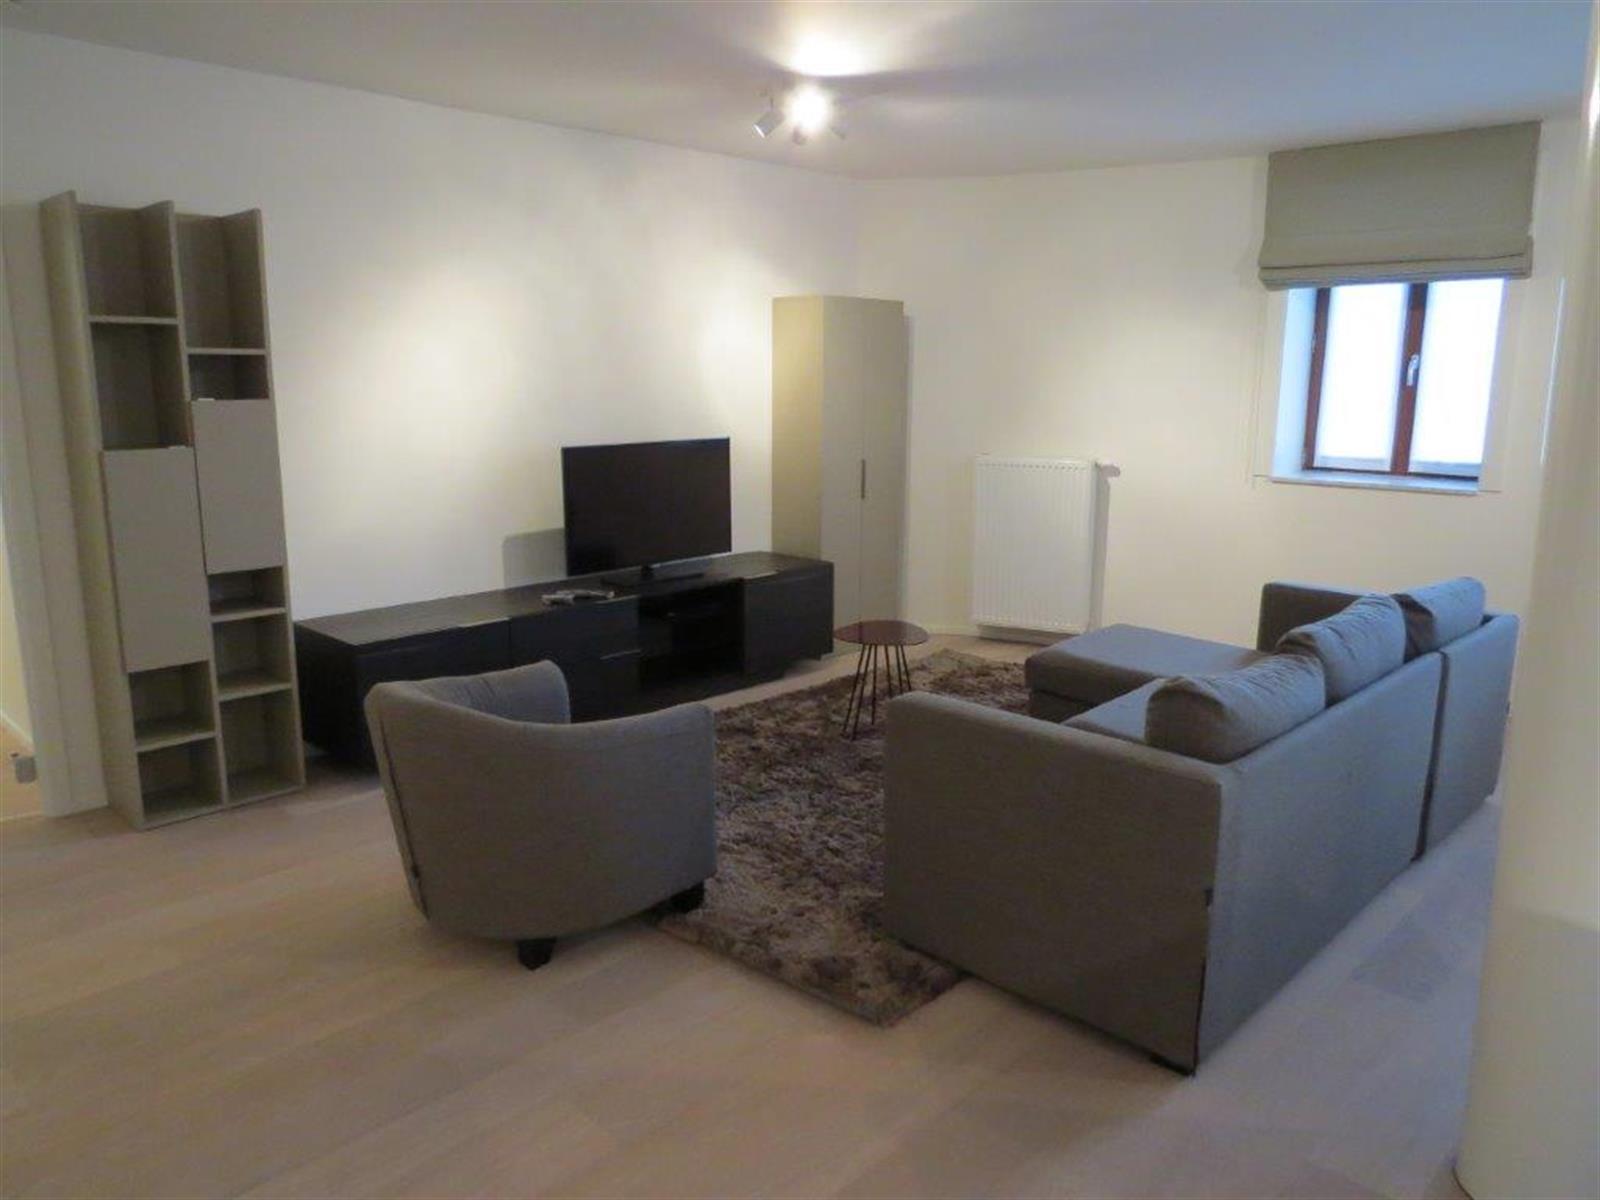 Appartement - Auderghem - #3950122-2